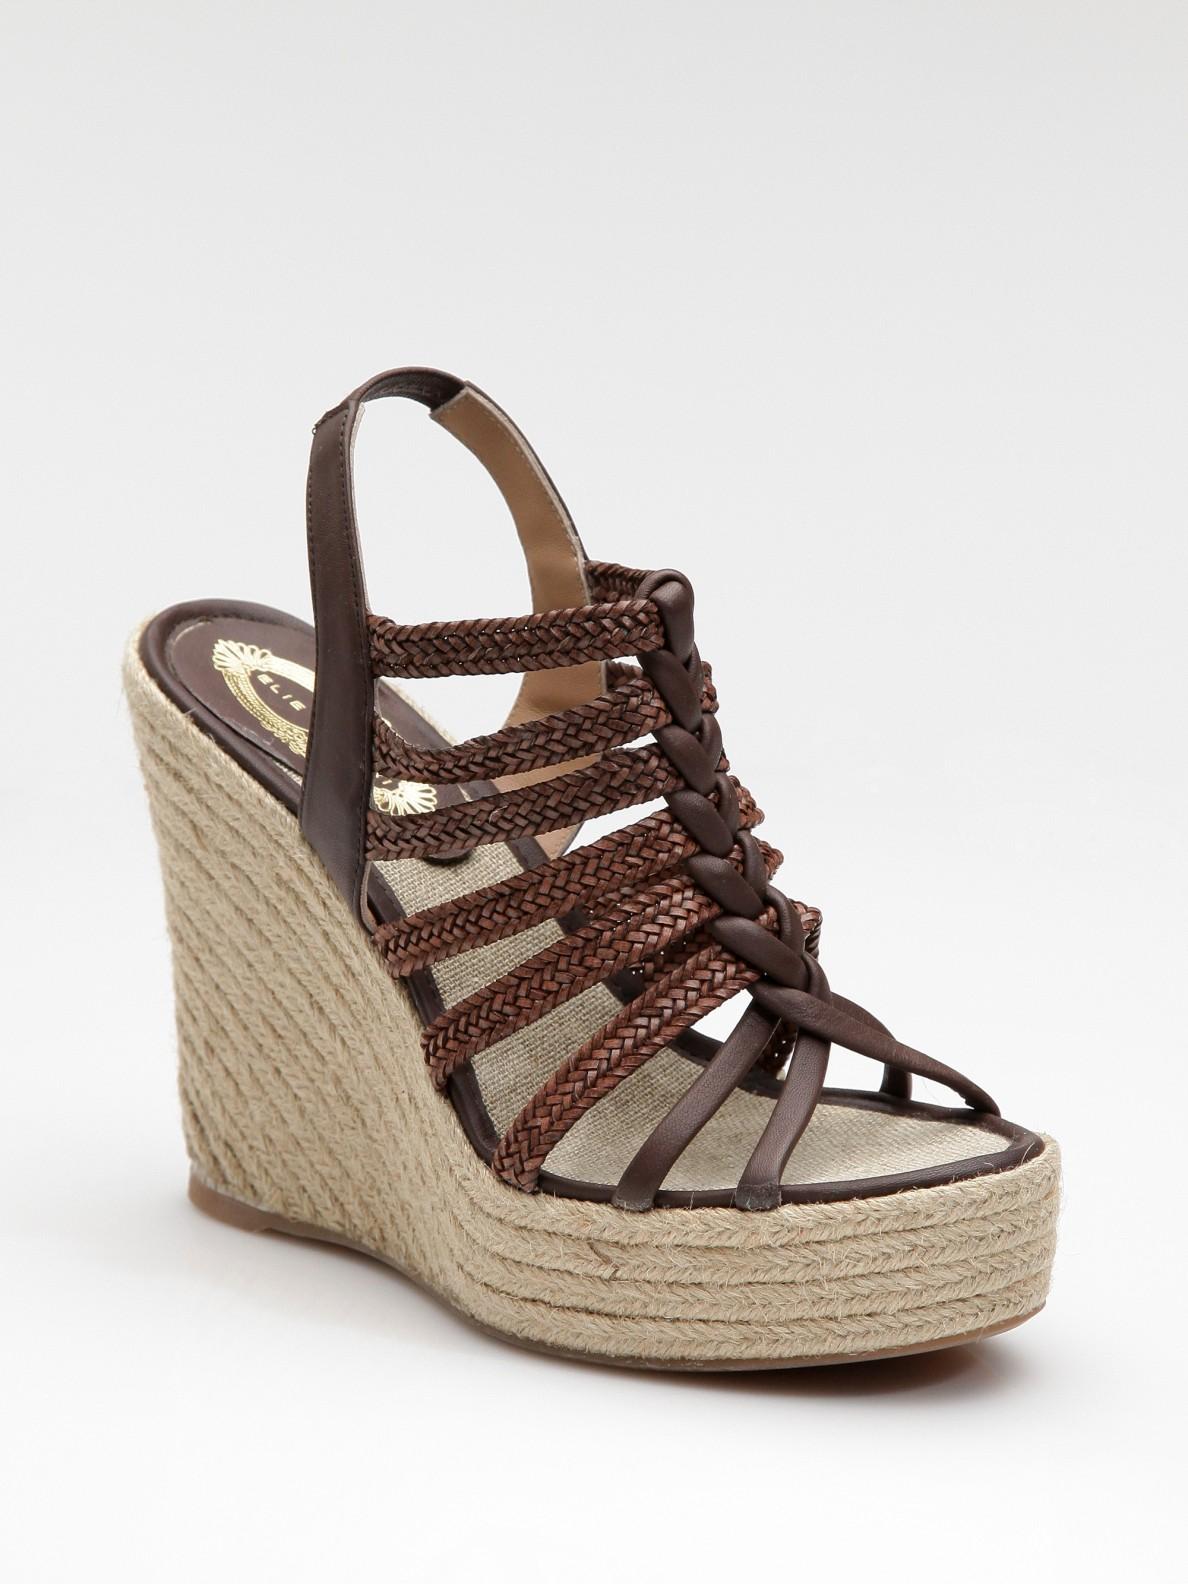 Elie Tahari Strappy Espadrille Wedge Sandals In Brown Lyst